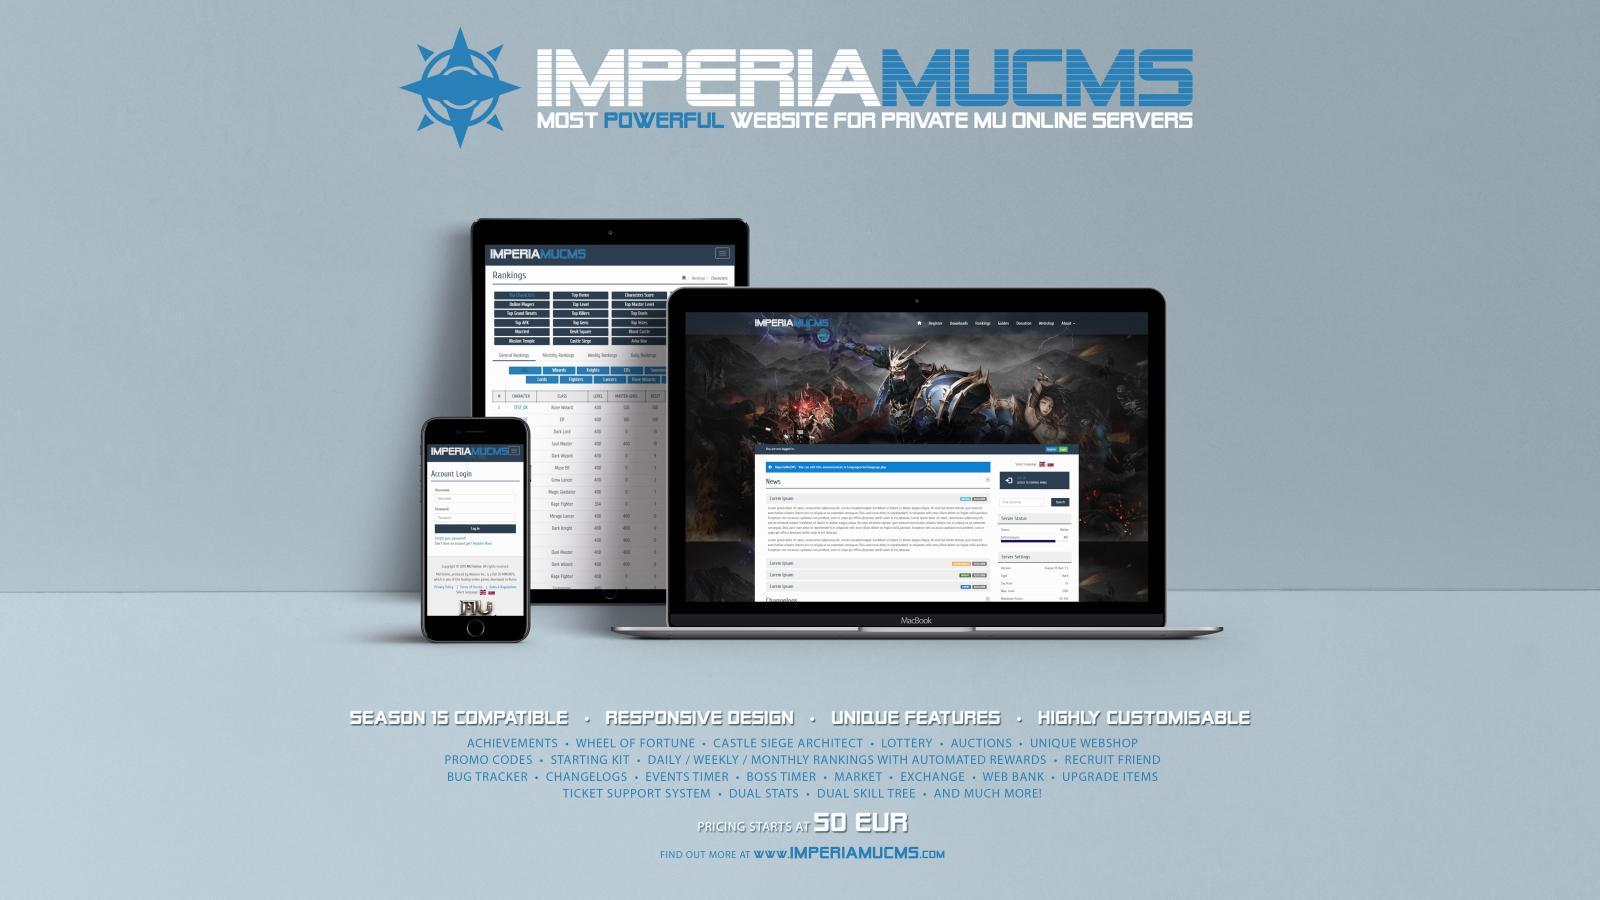 ImperiaMuCMS v2